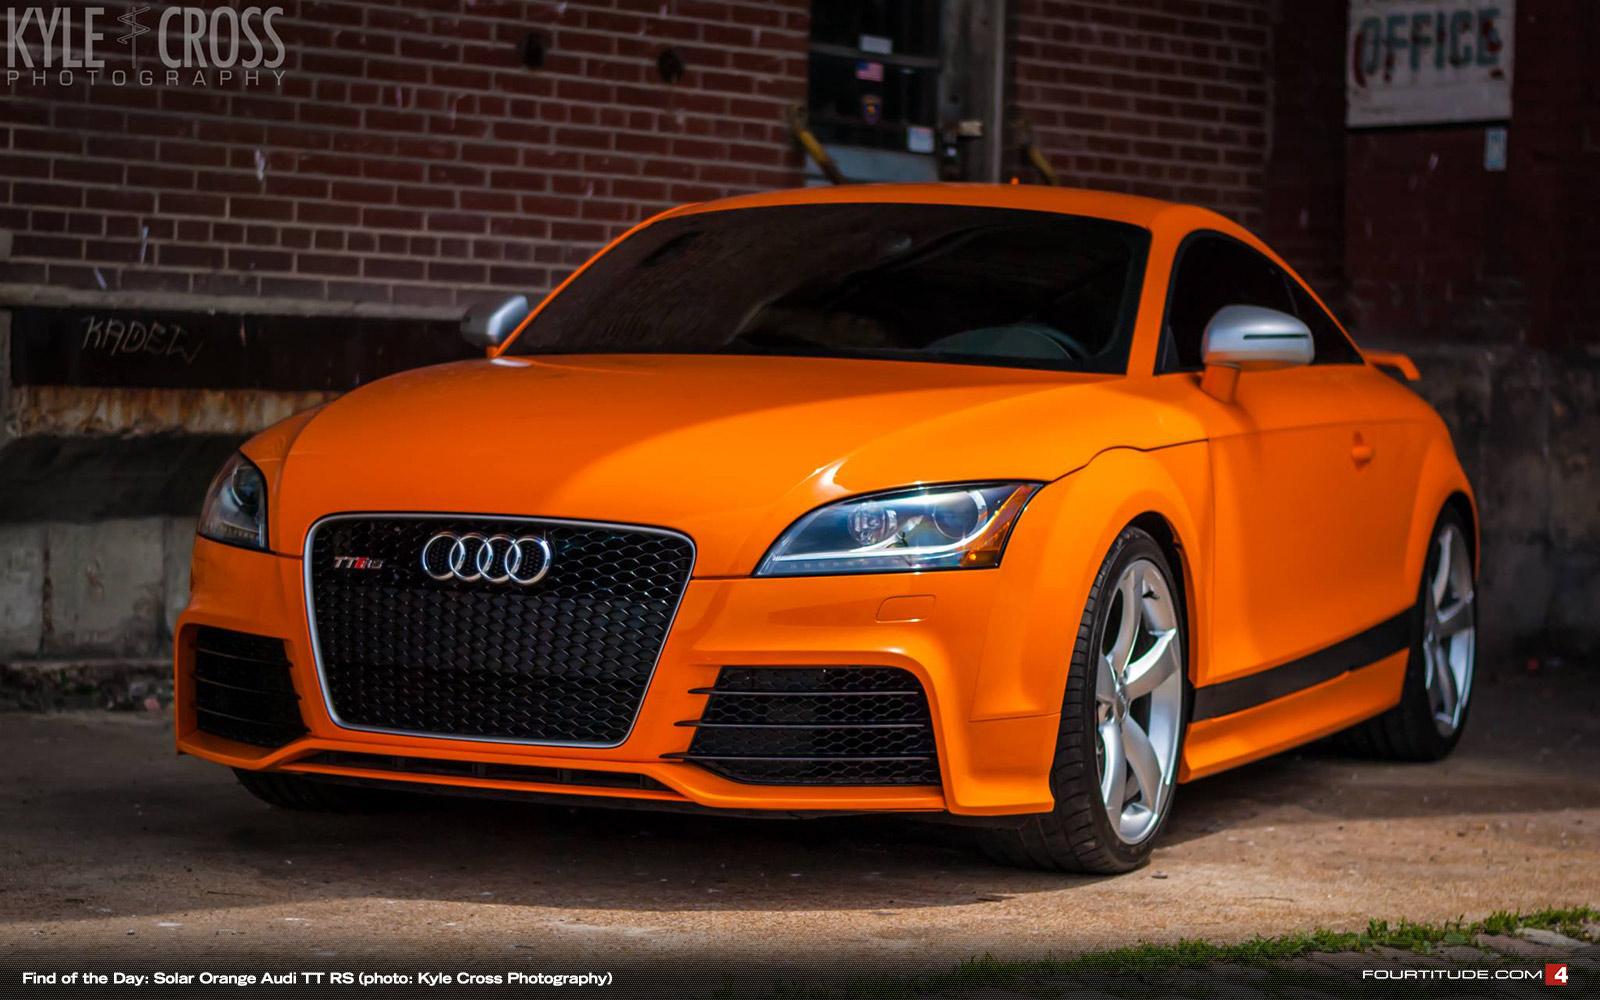 Universal Front Car Racing Stripes Multicolor 20x185cm